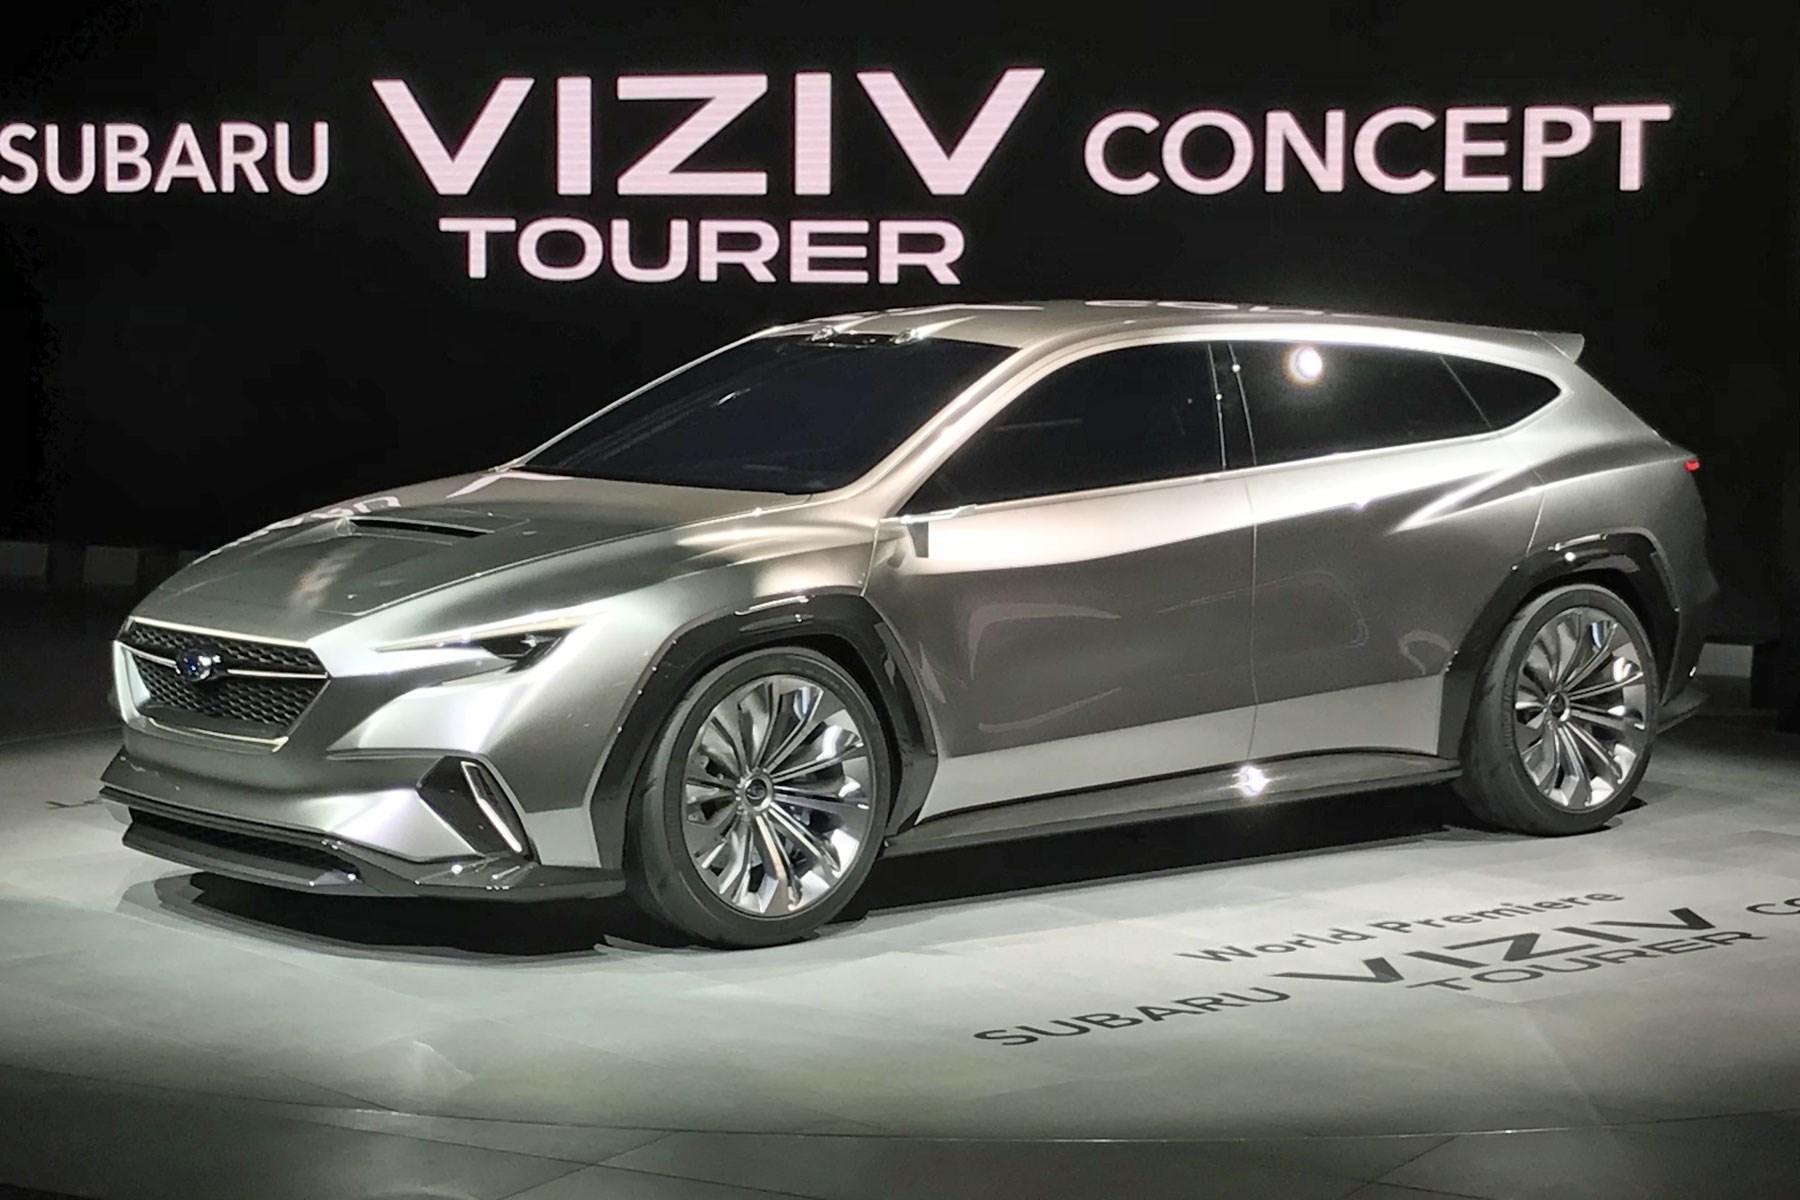 Subaru Viziv Tourer Concept At The 2018 Geneva Motor Show